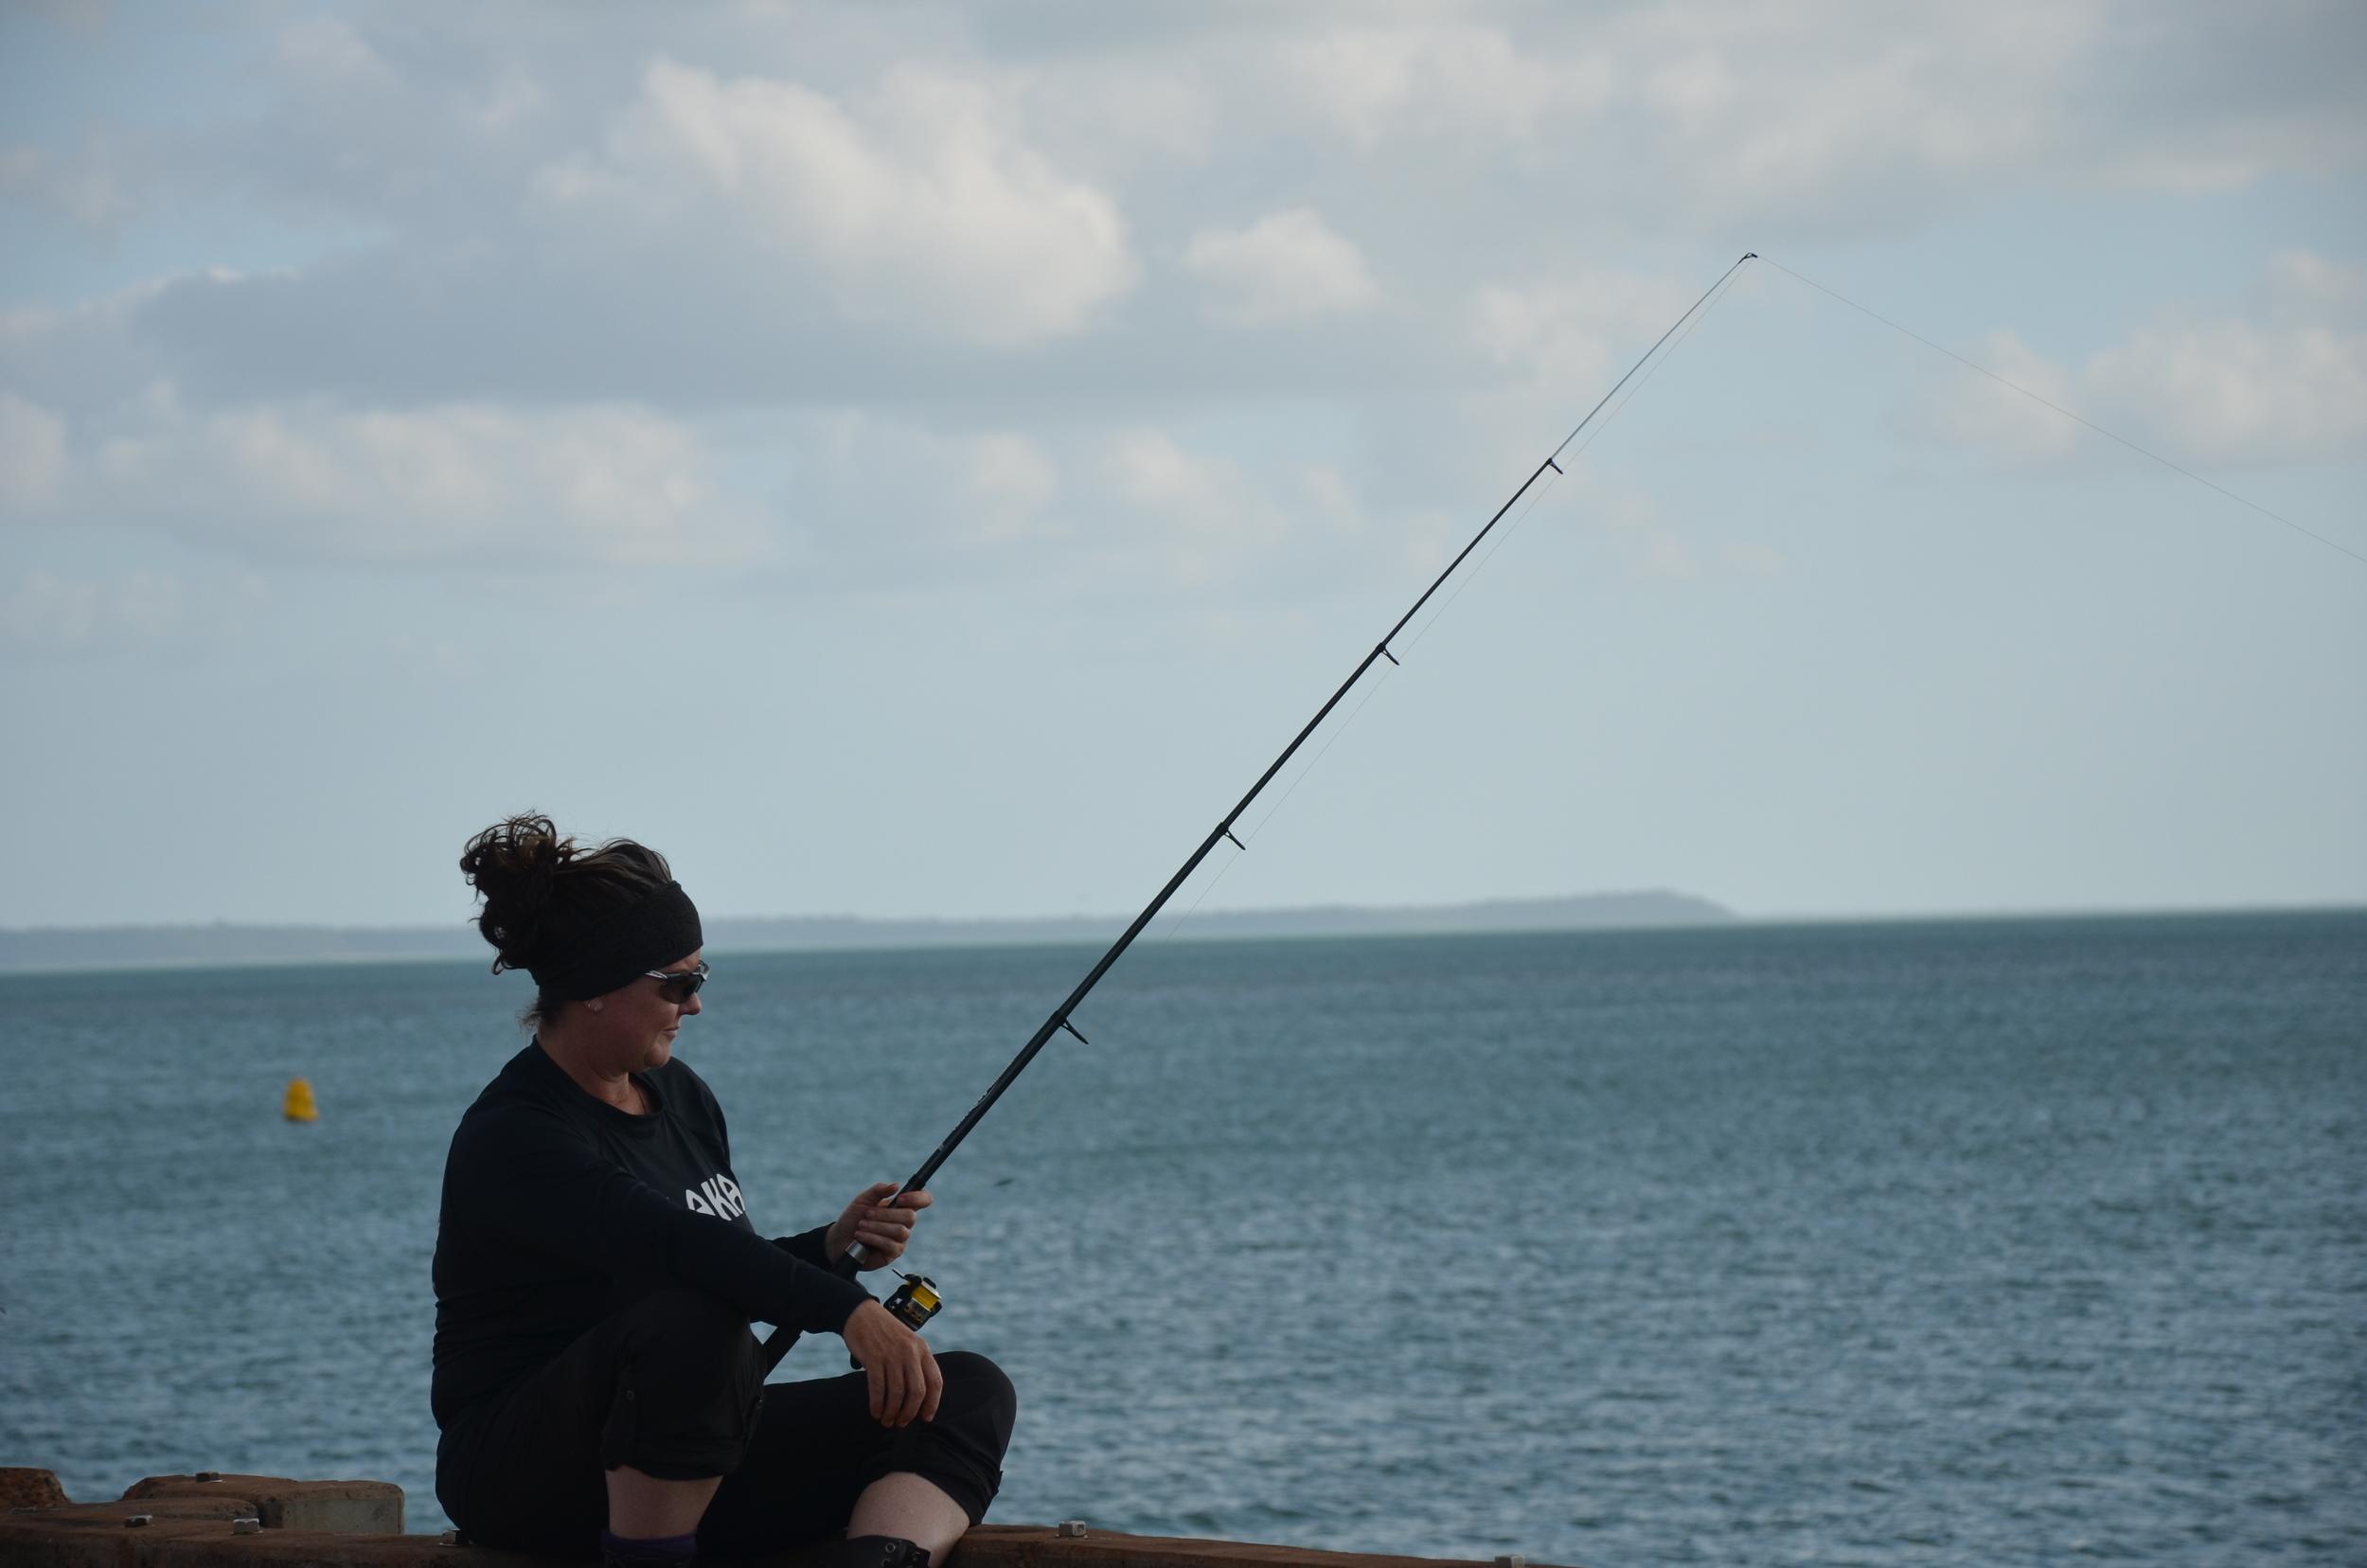 Fishing on the Seisia pier.